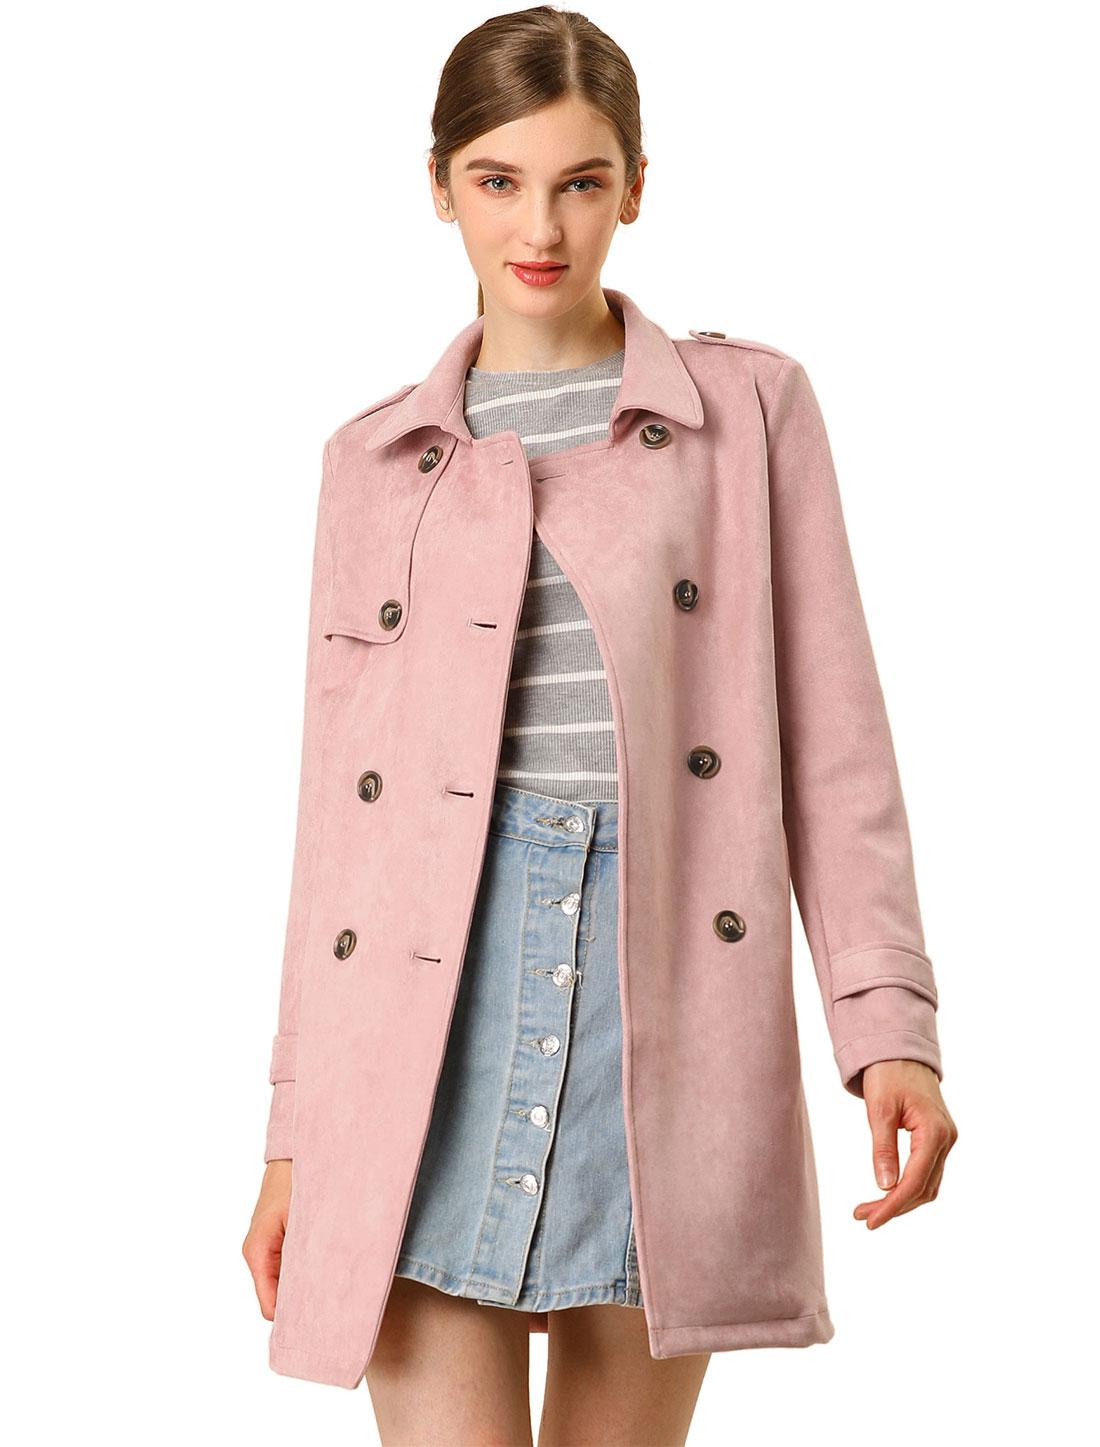 Allegra K Women Faux Suede Trench Coat Jacket with Belt Pink L